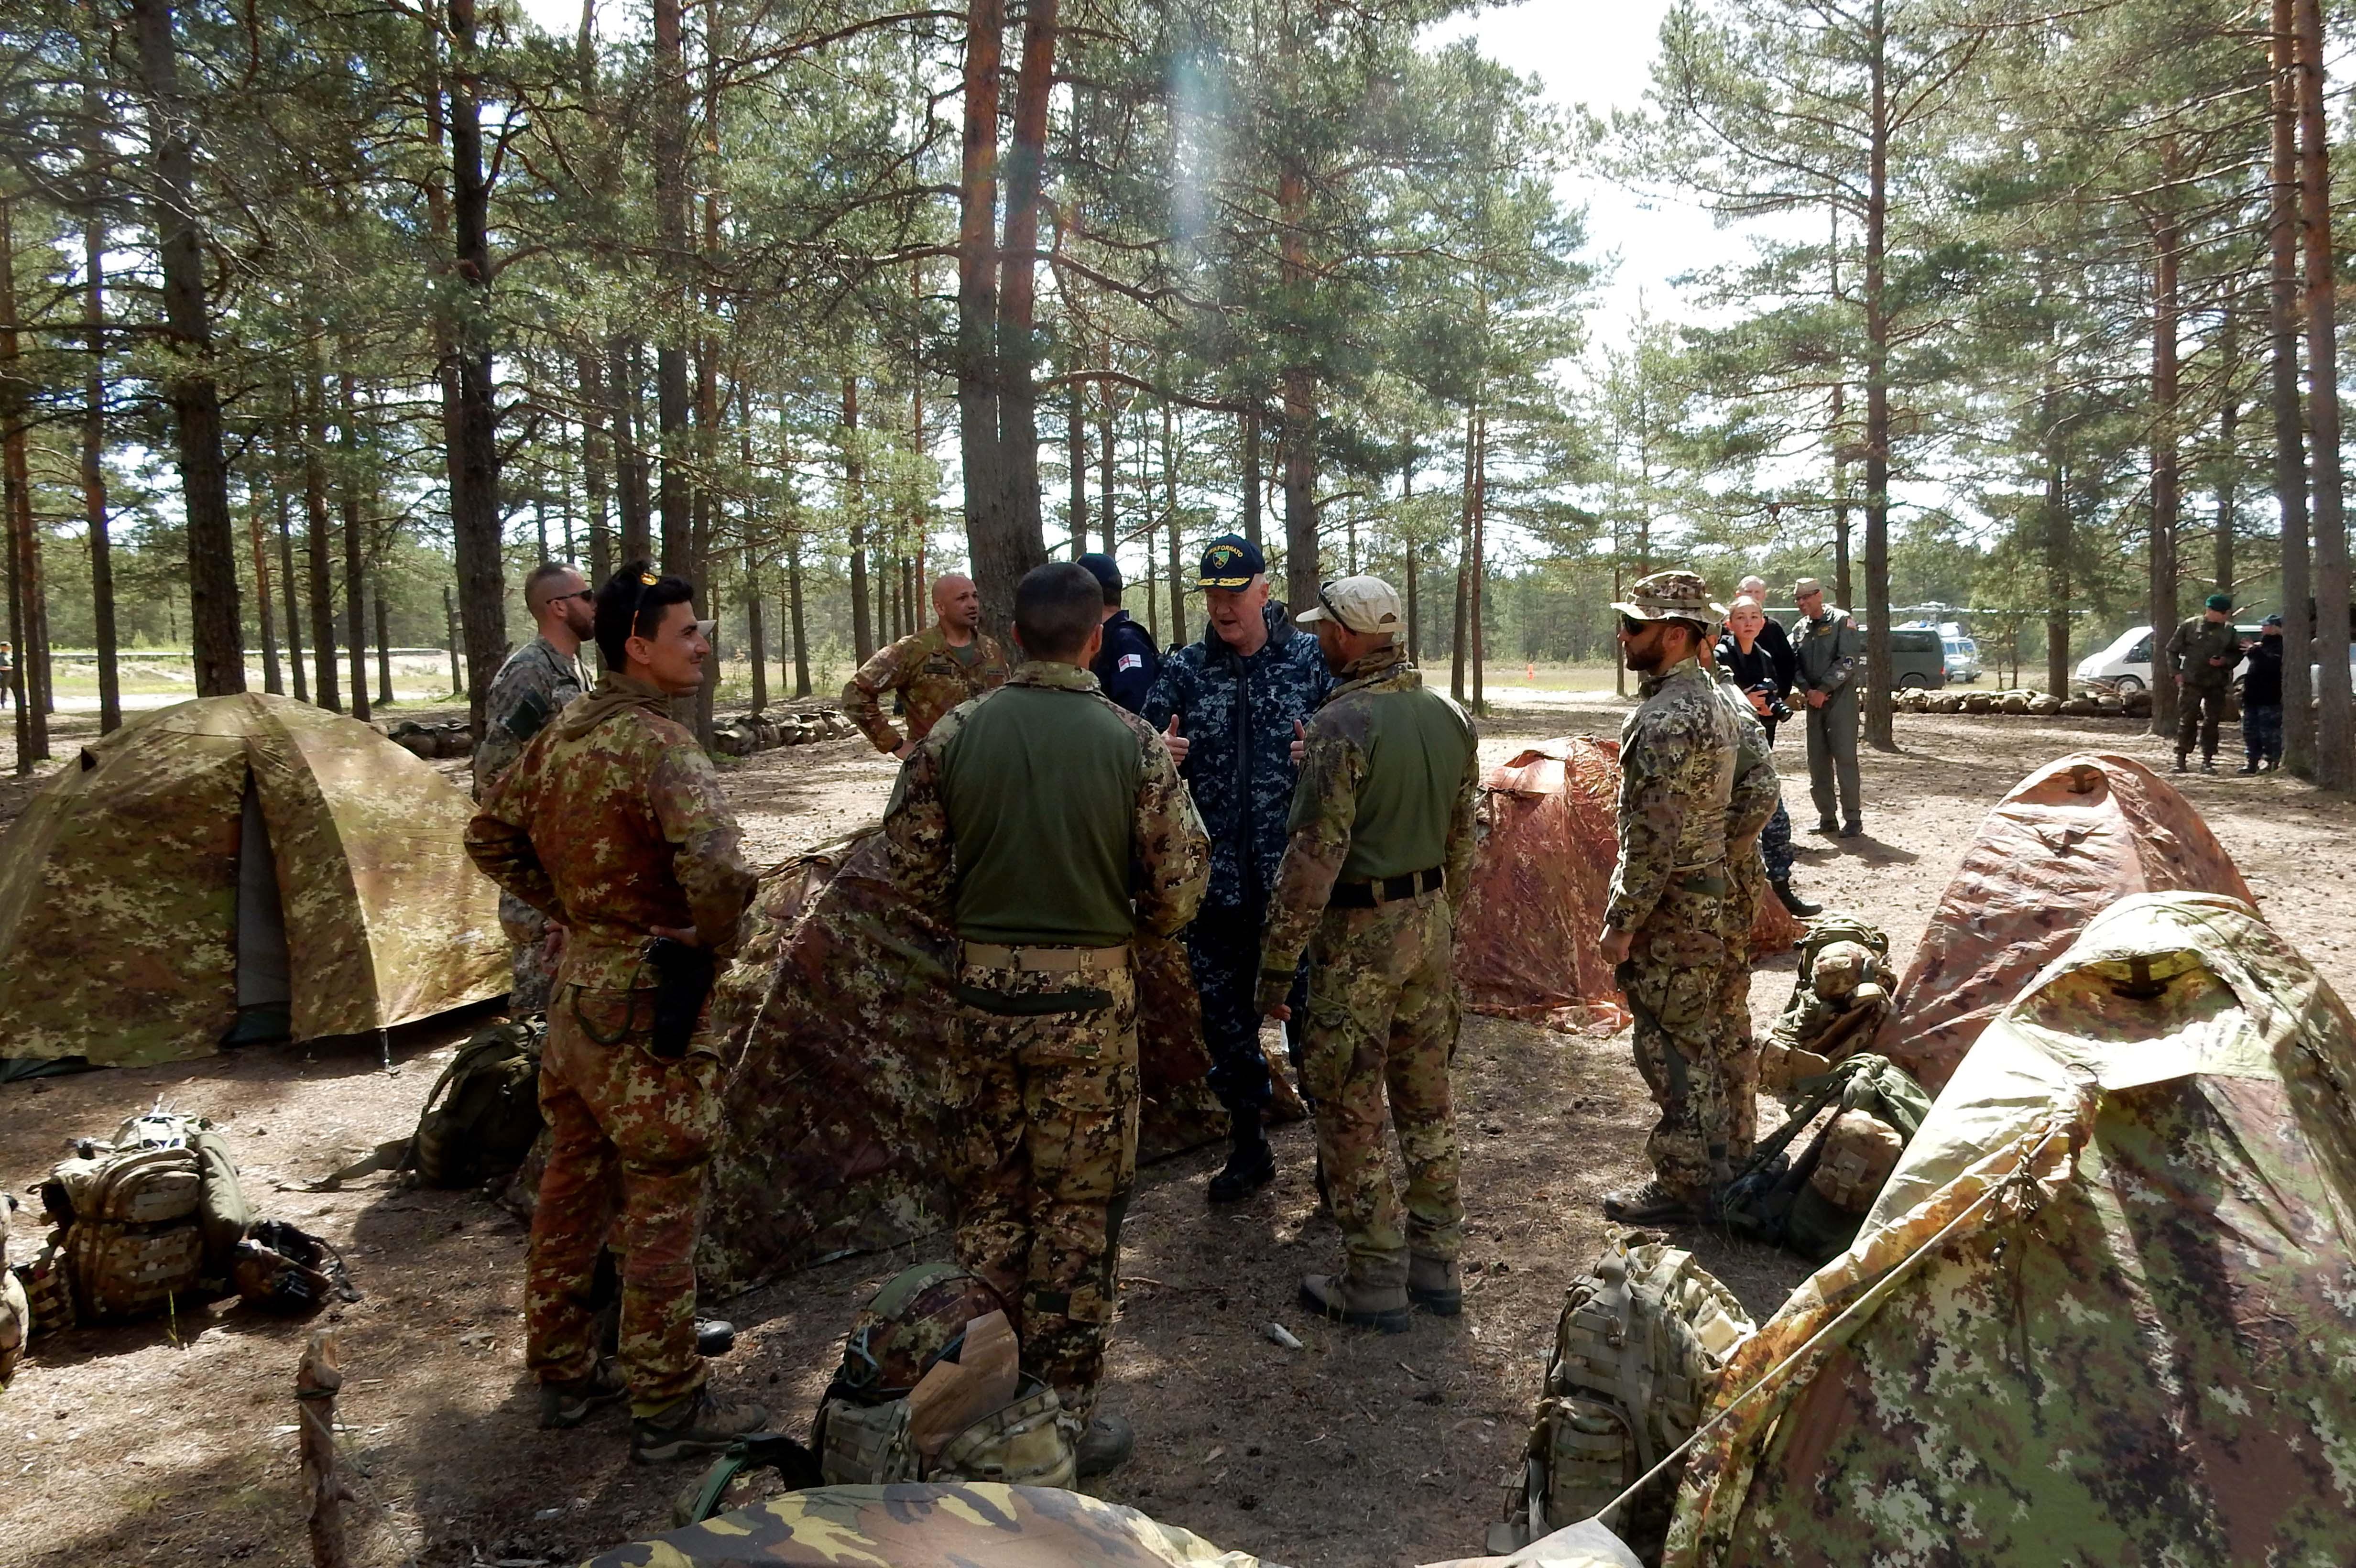 Vice Adm. Foggo speaks with Italian Marines training in Finland during BALTOPS 2016. U.S. Navy/Mass Communication Specialist Seaman Alyssa Weeks photo